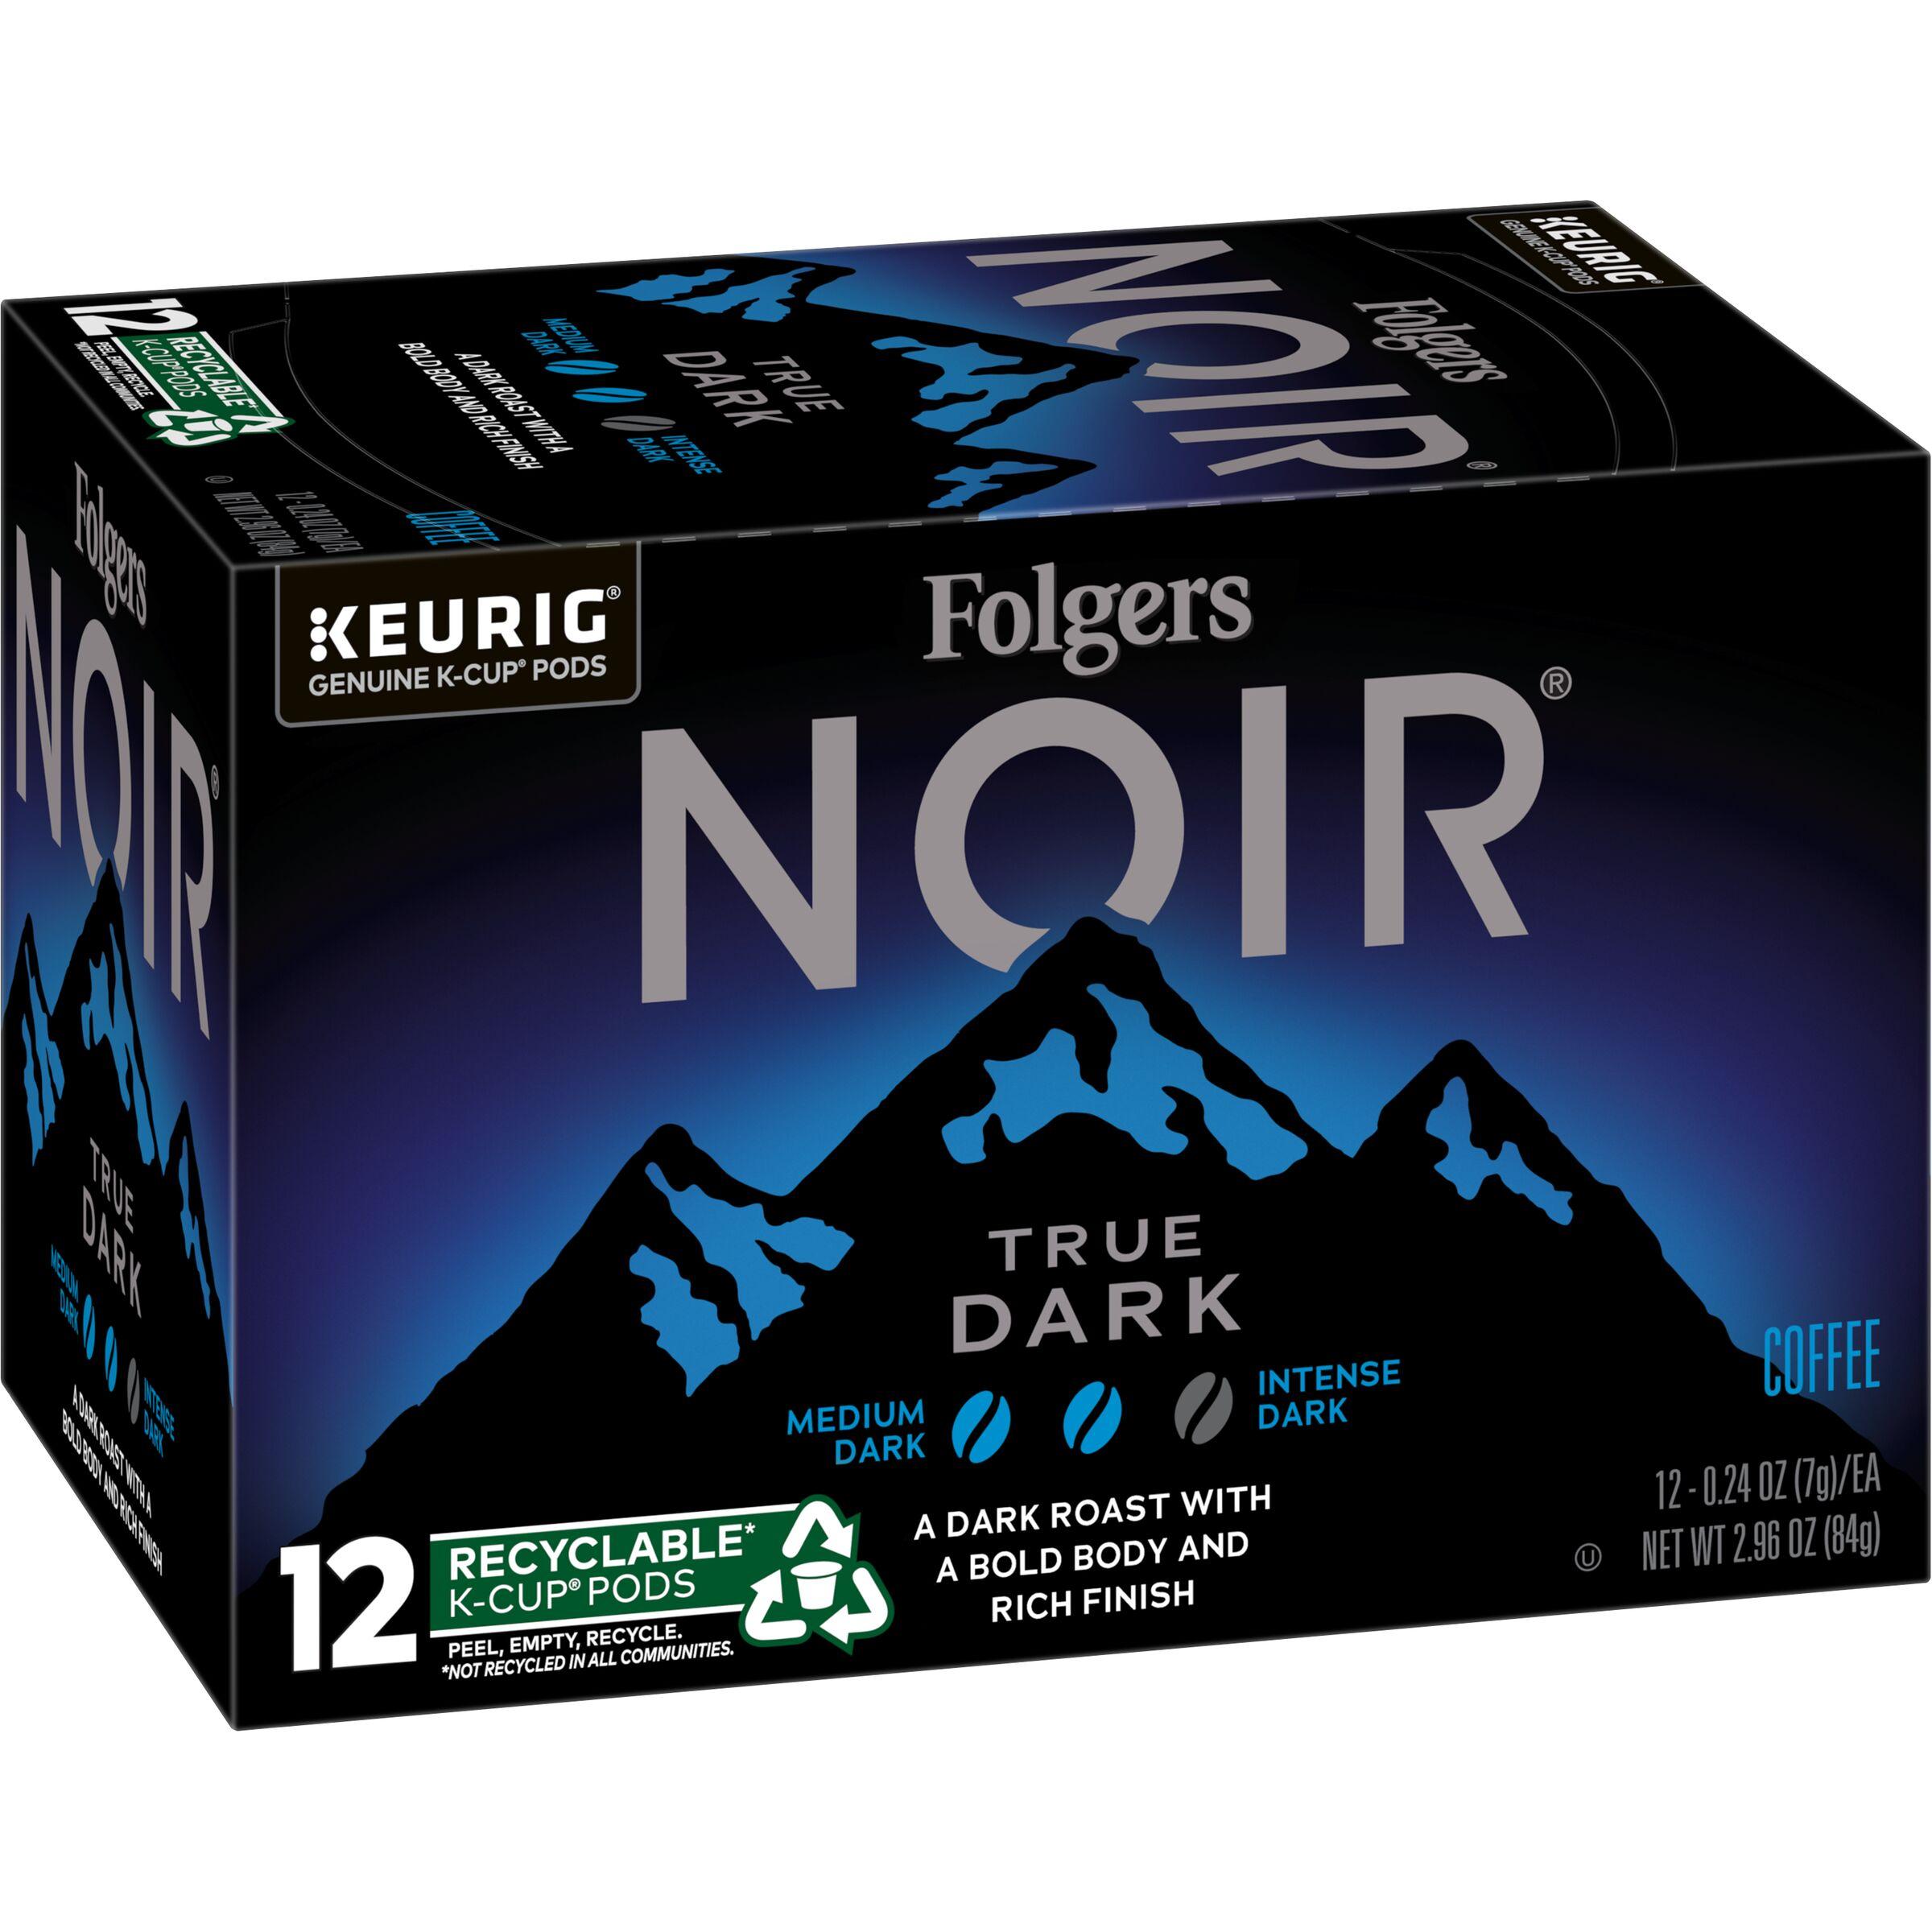 Folgers Noir True Dark K-Cup® Pods